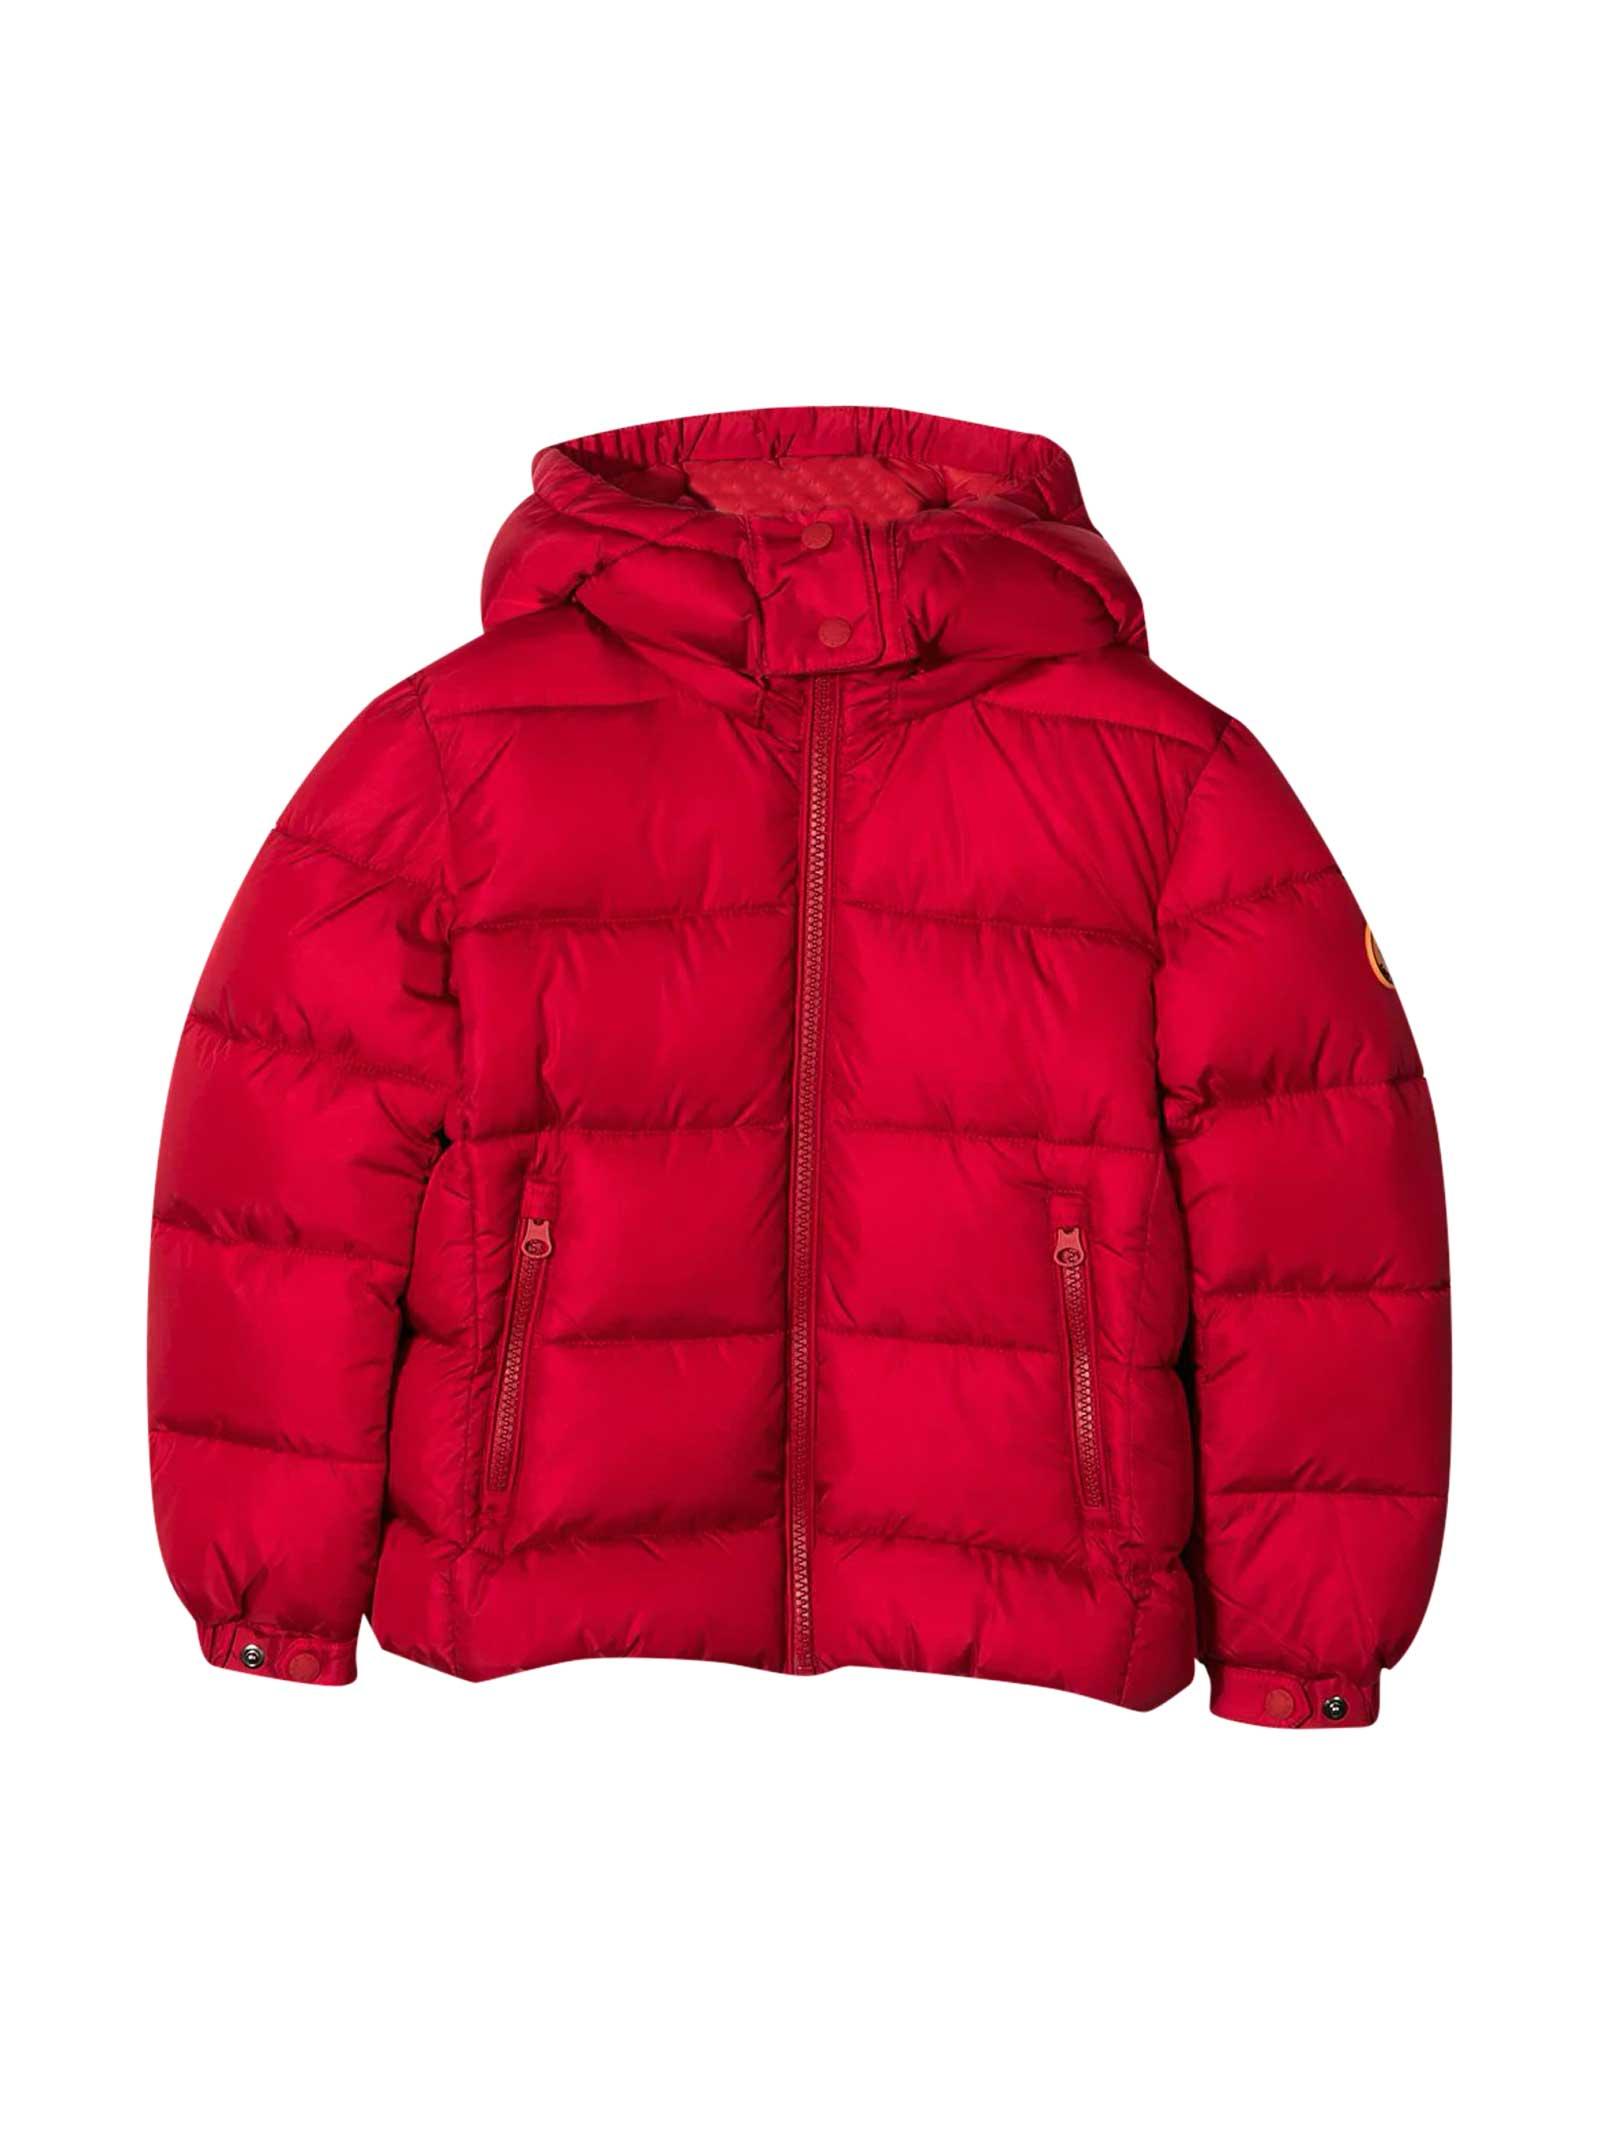 Save the Duck Red Lightweight Jacket Kids